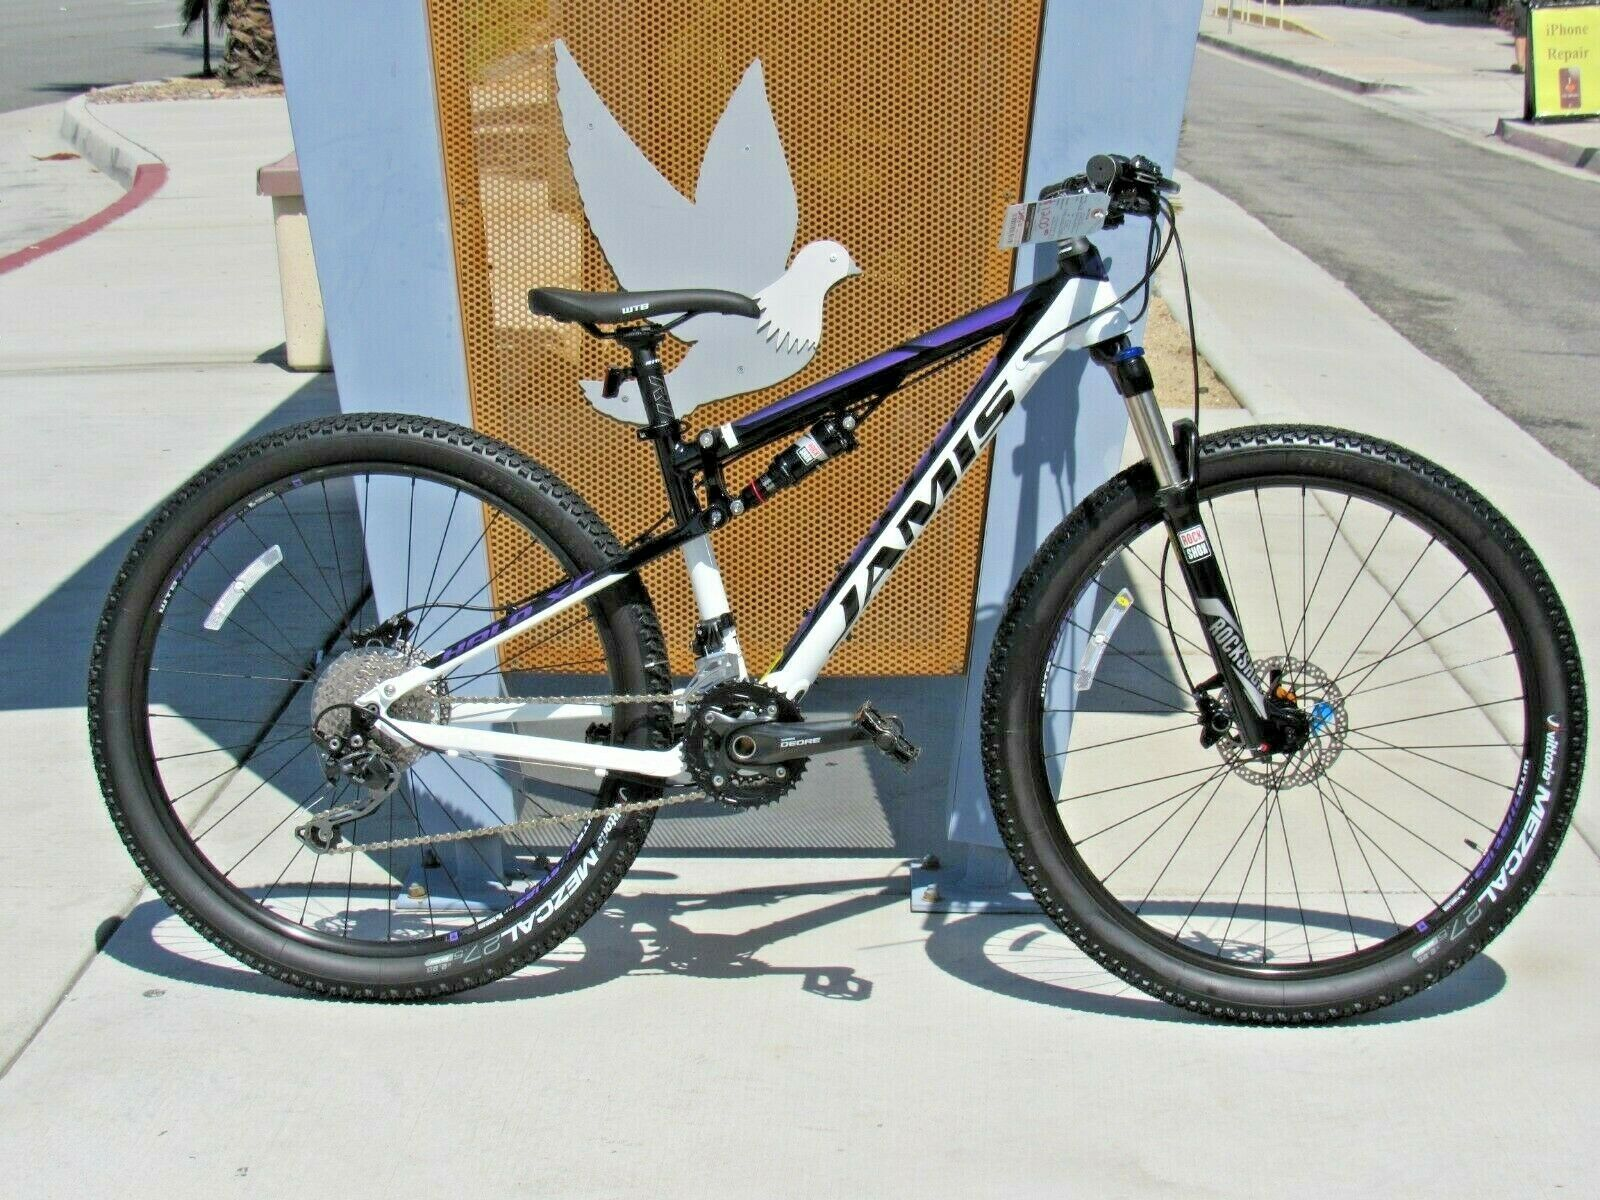 New 1400 2017 14 Jamis Halo Xc Full Suspension Mountain Bike New